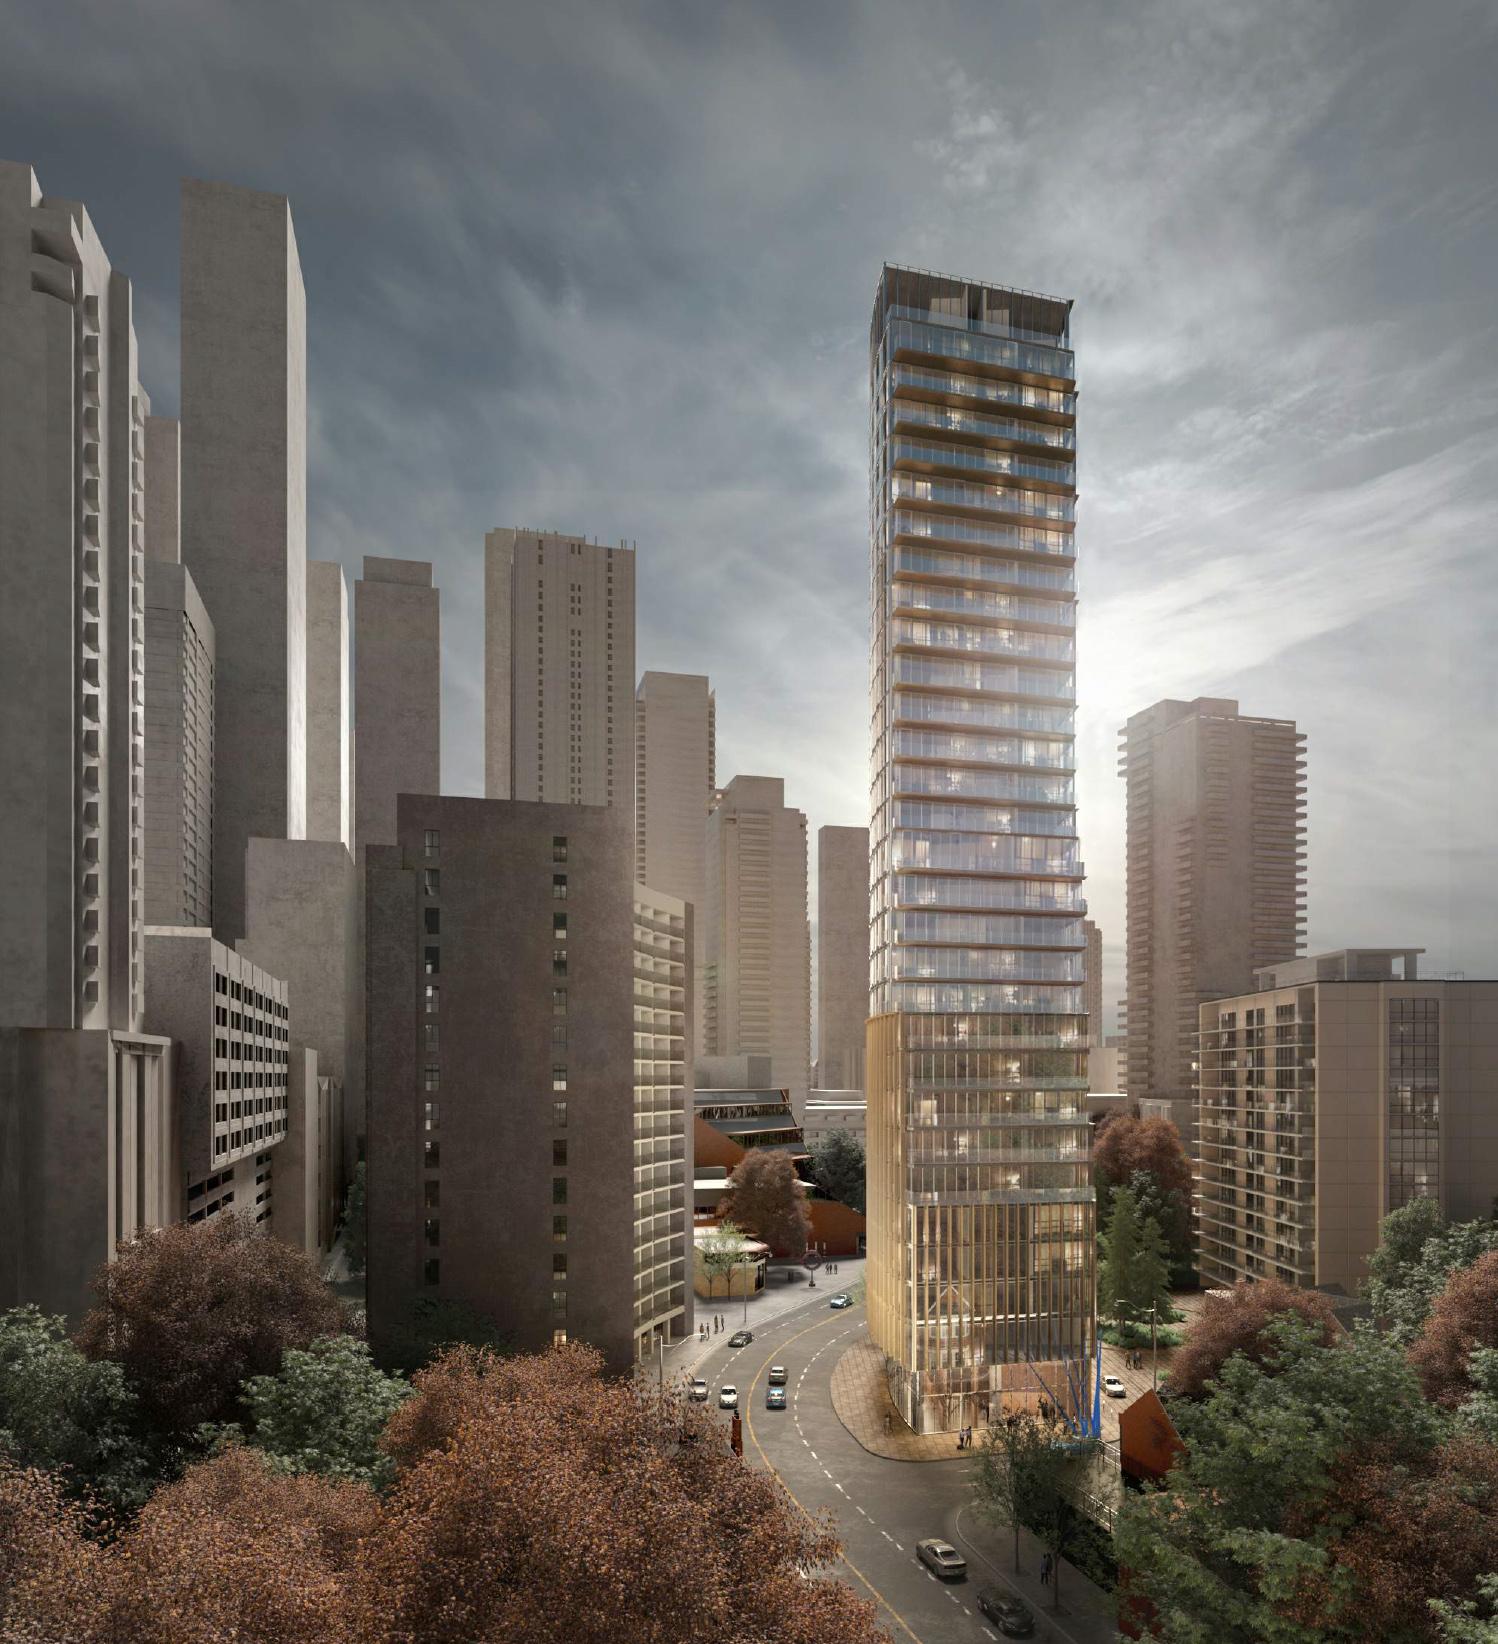 717 Church St., Toronto, designed by Diamond and Schmitt Architects for Capital Developments.